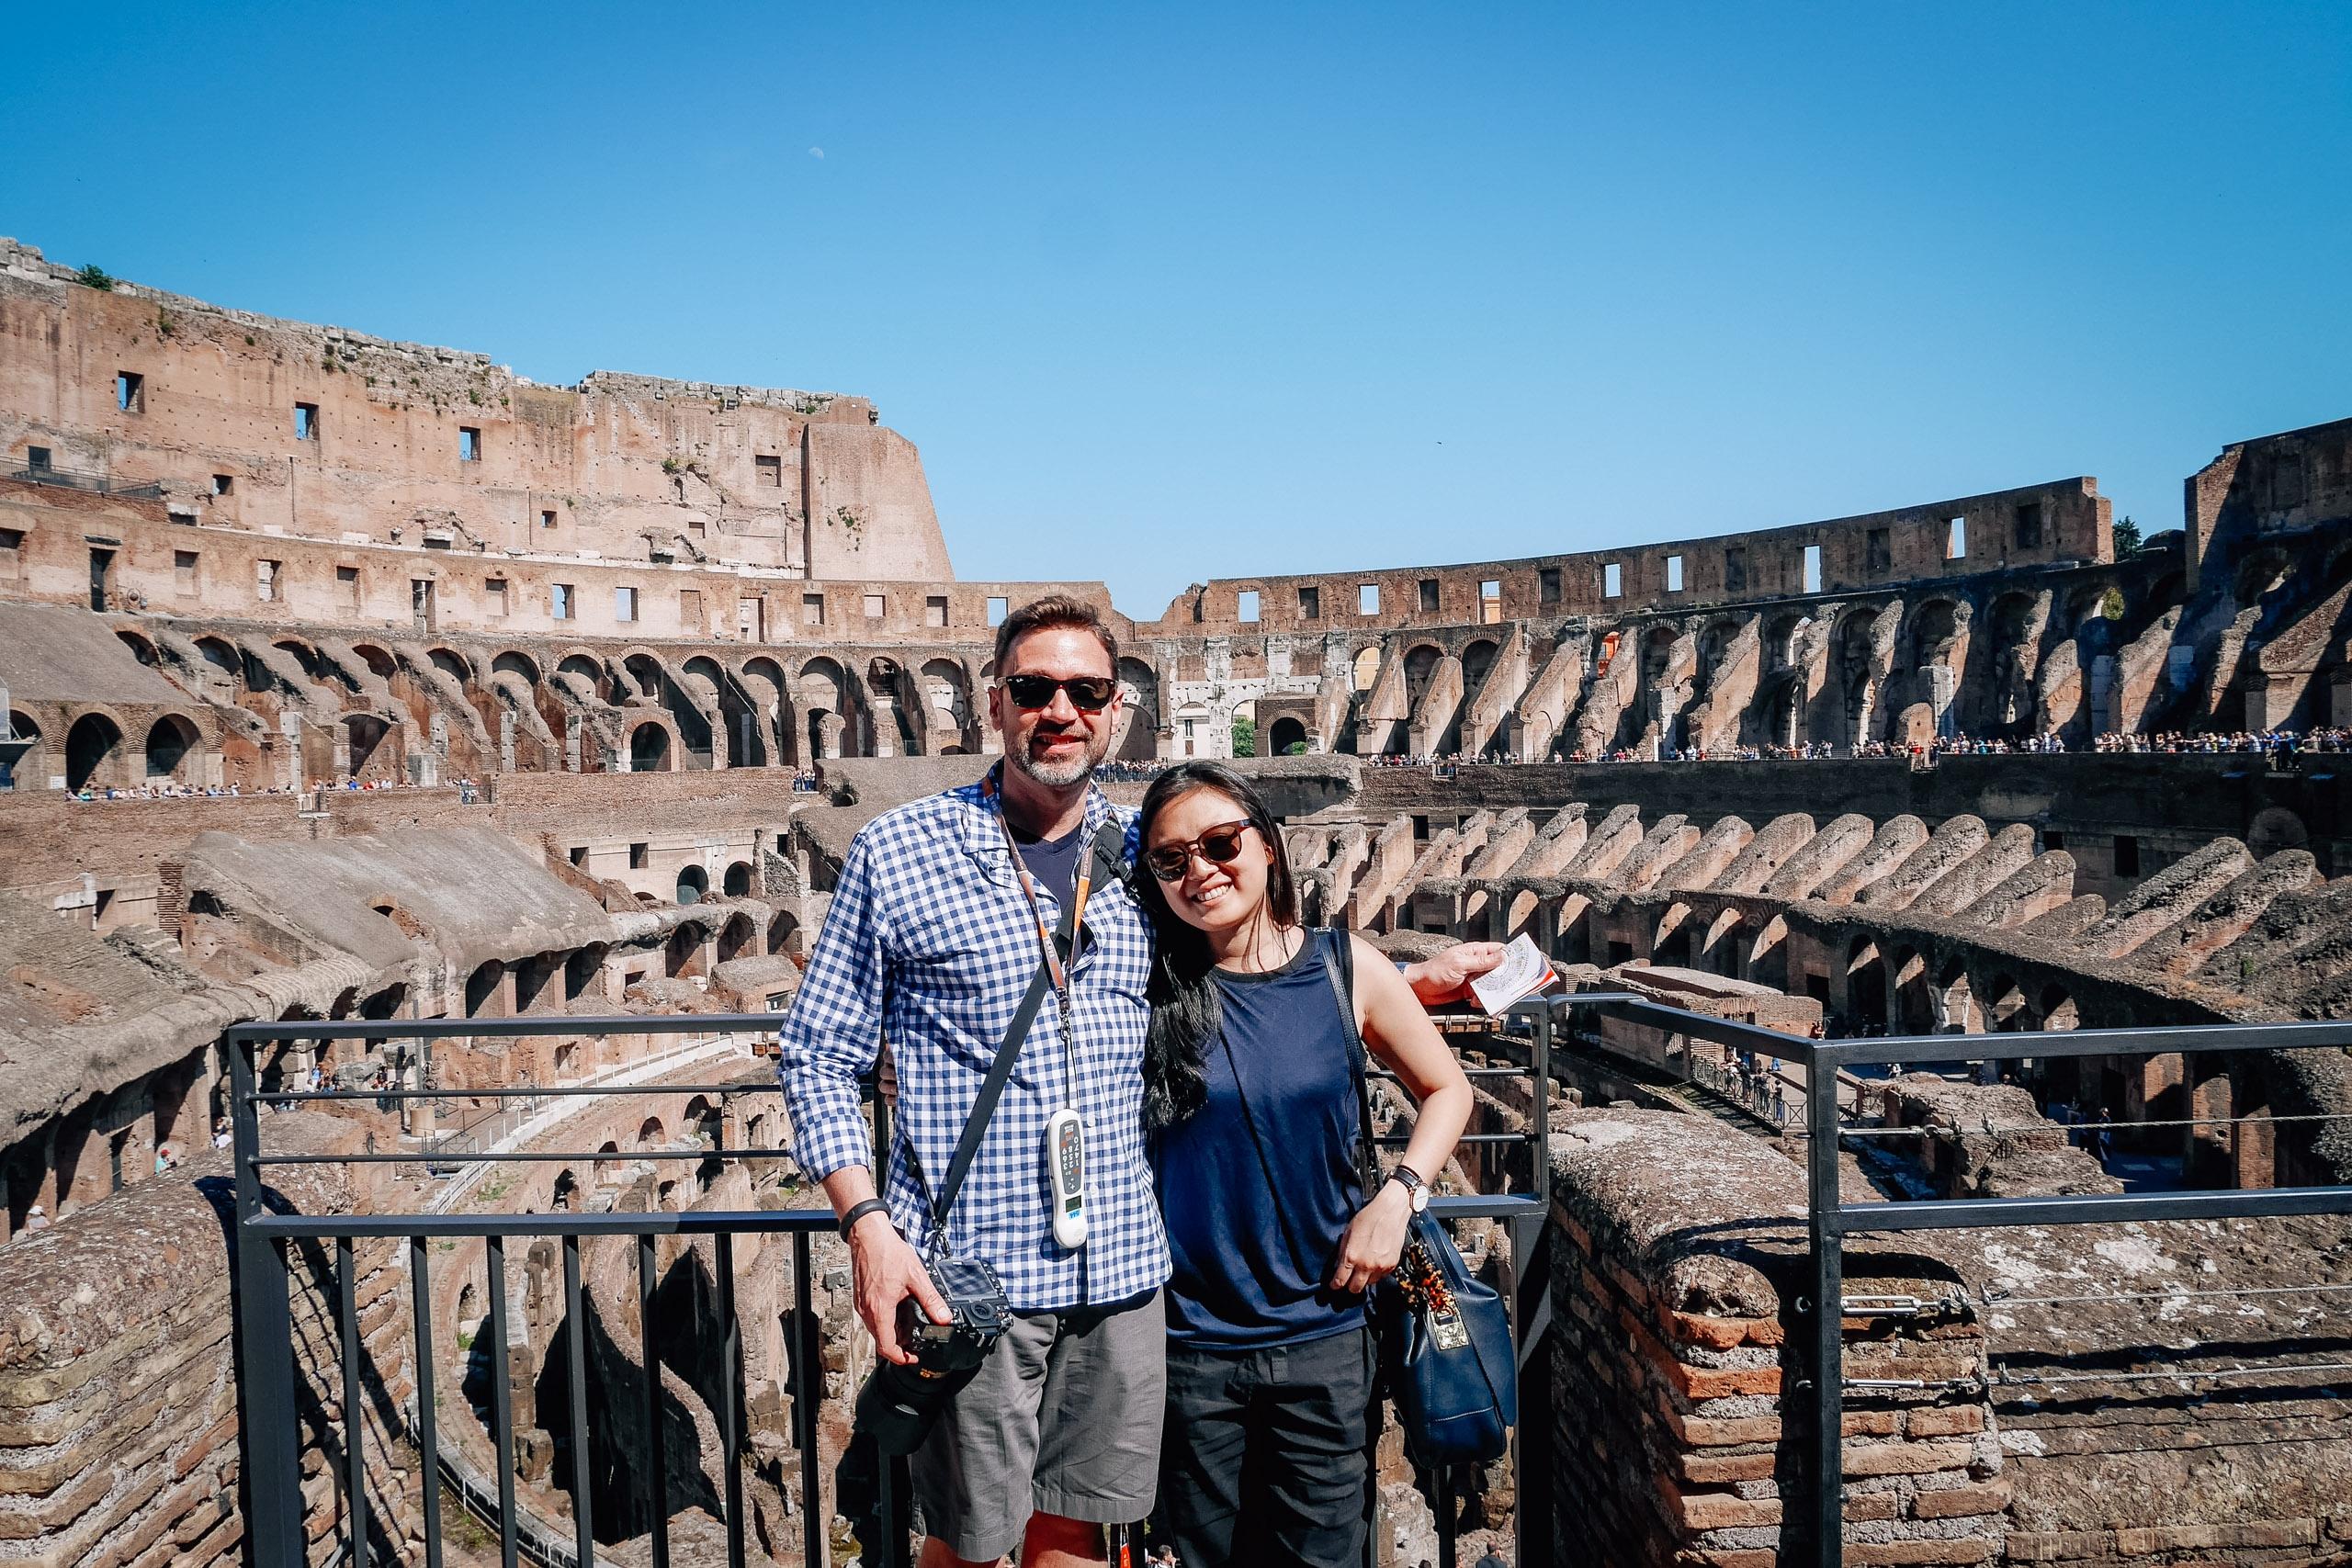 Kris and Jessica Inside the Colosseum